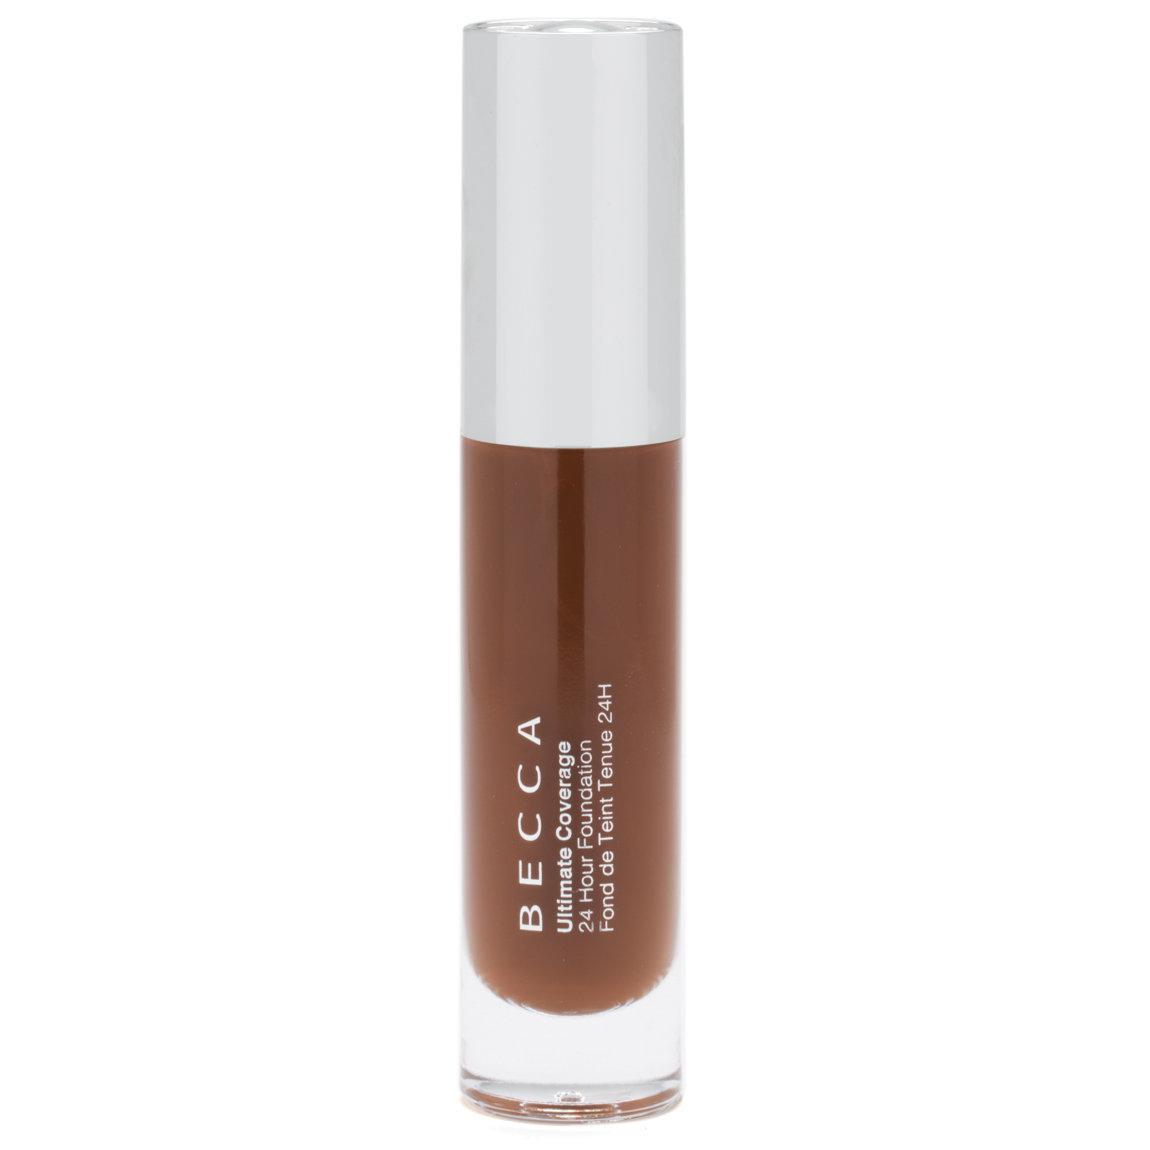 BECCA Cosmetics Ultimate Coverage 24 Hour Foundation Chestnut 6C3 alternative view 1.